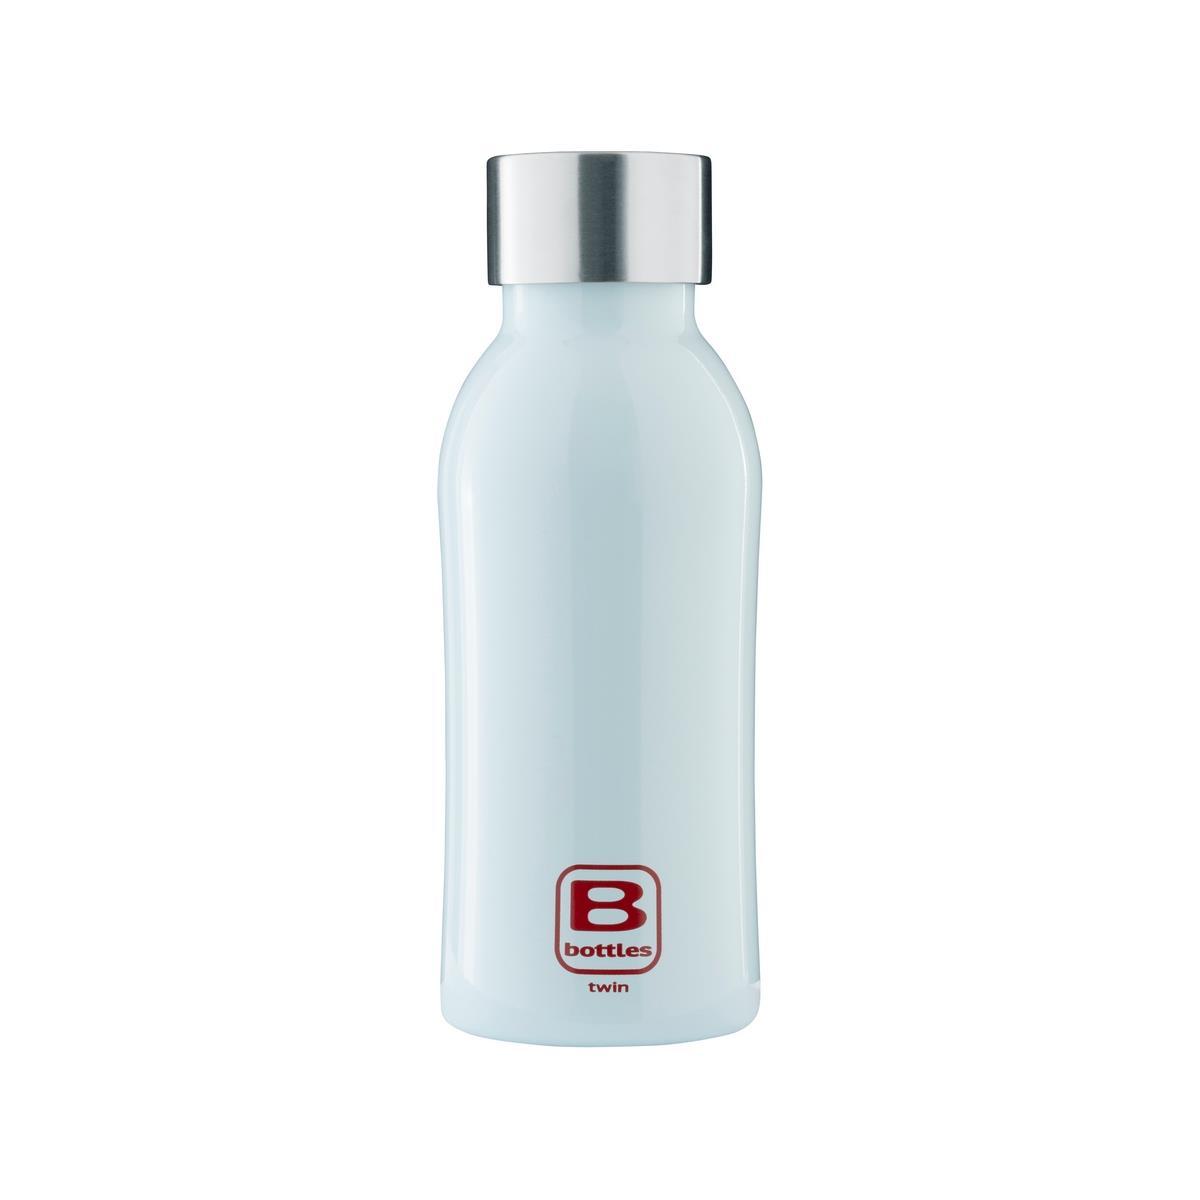 B Bottles Twin - Light Blue - 350 ml - Bottiglia Termica a doppia parete in acciaio inox 18/10